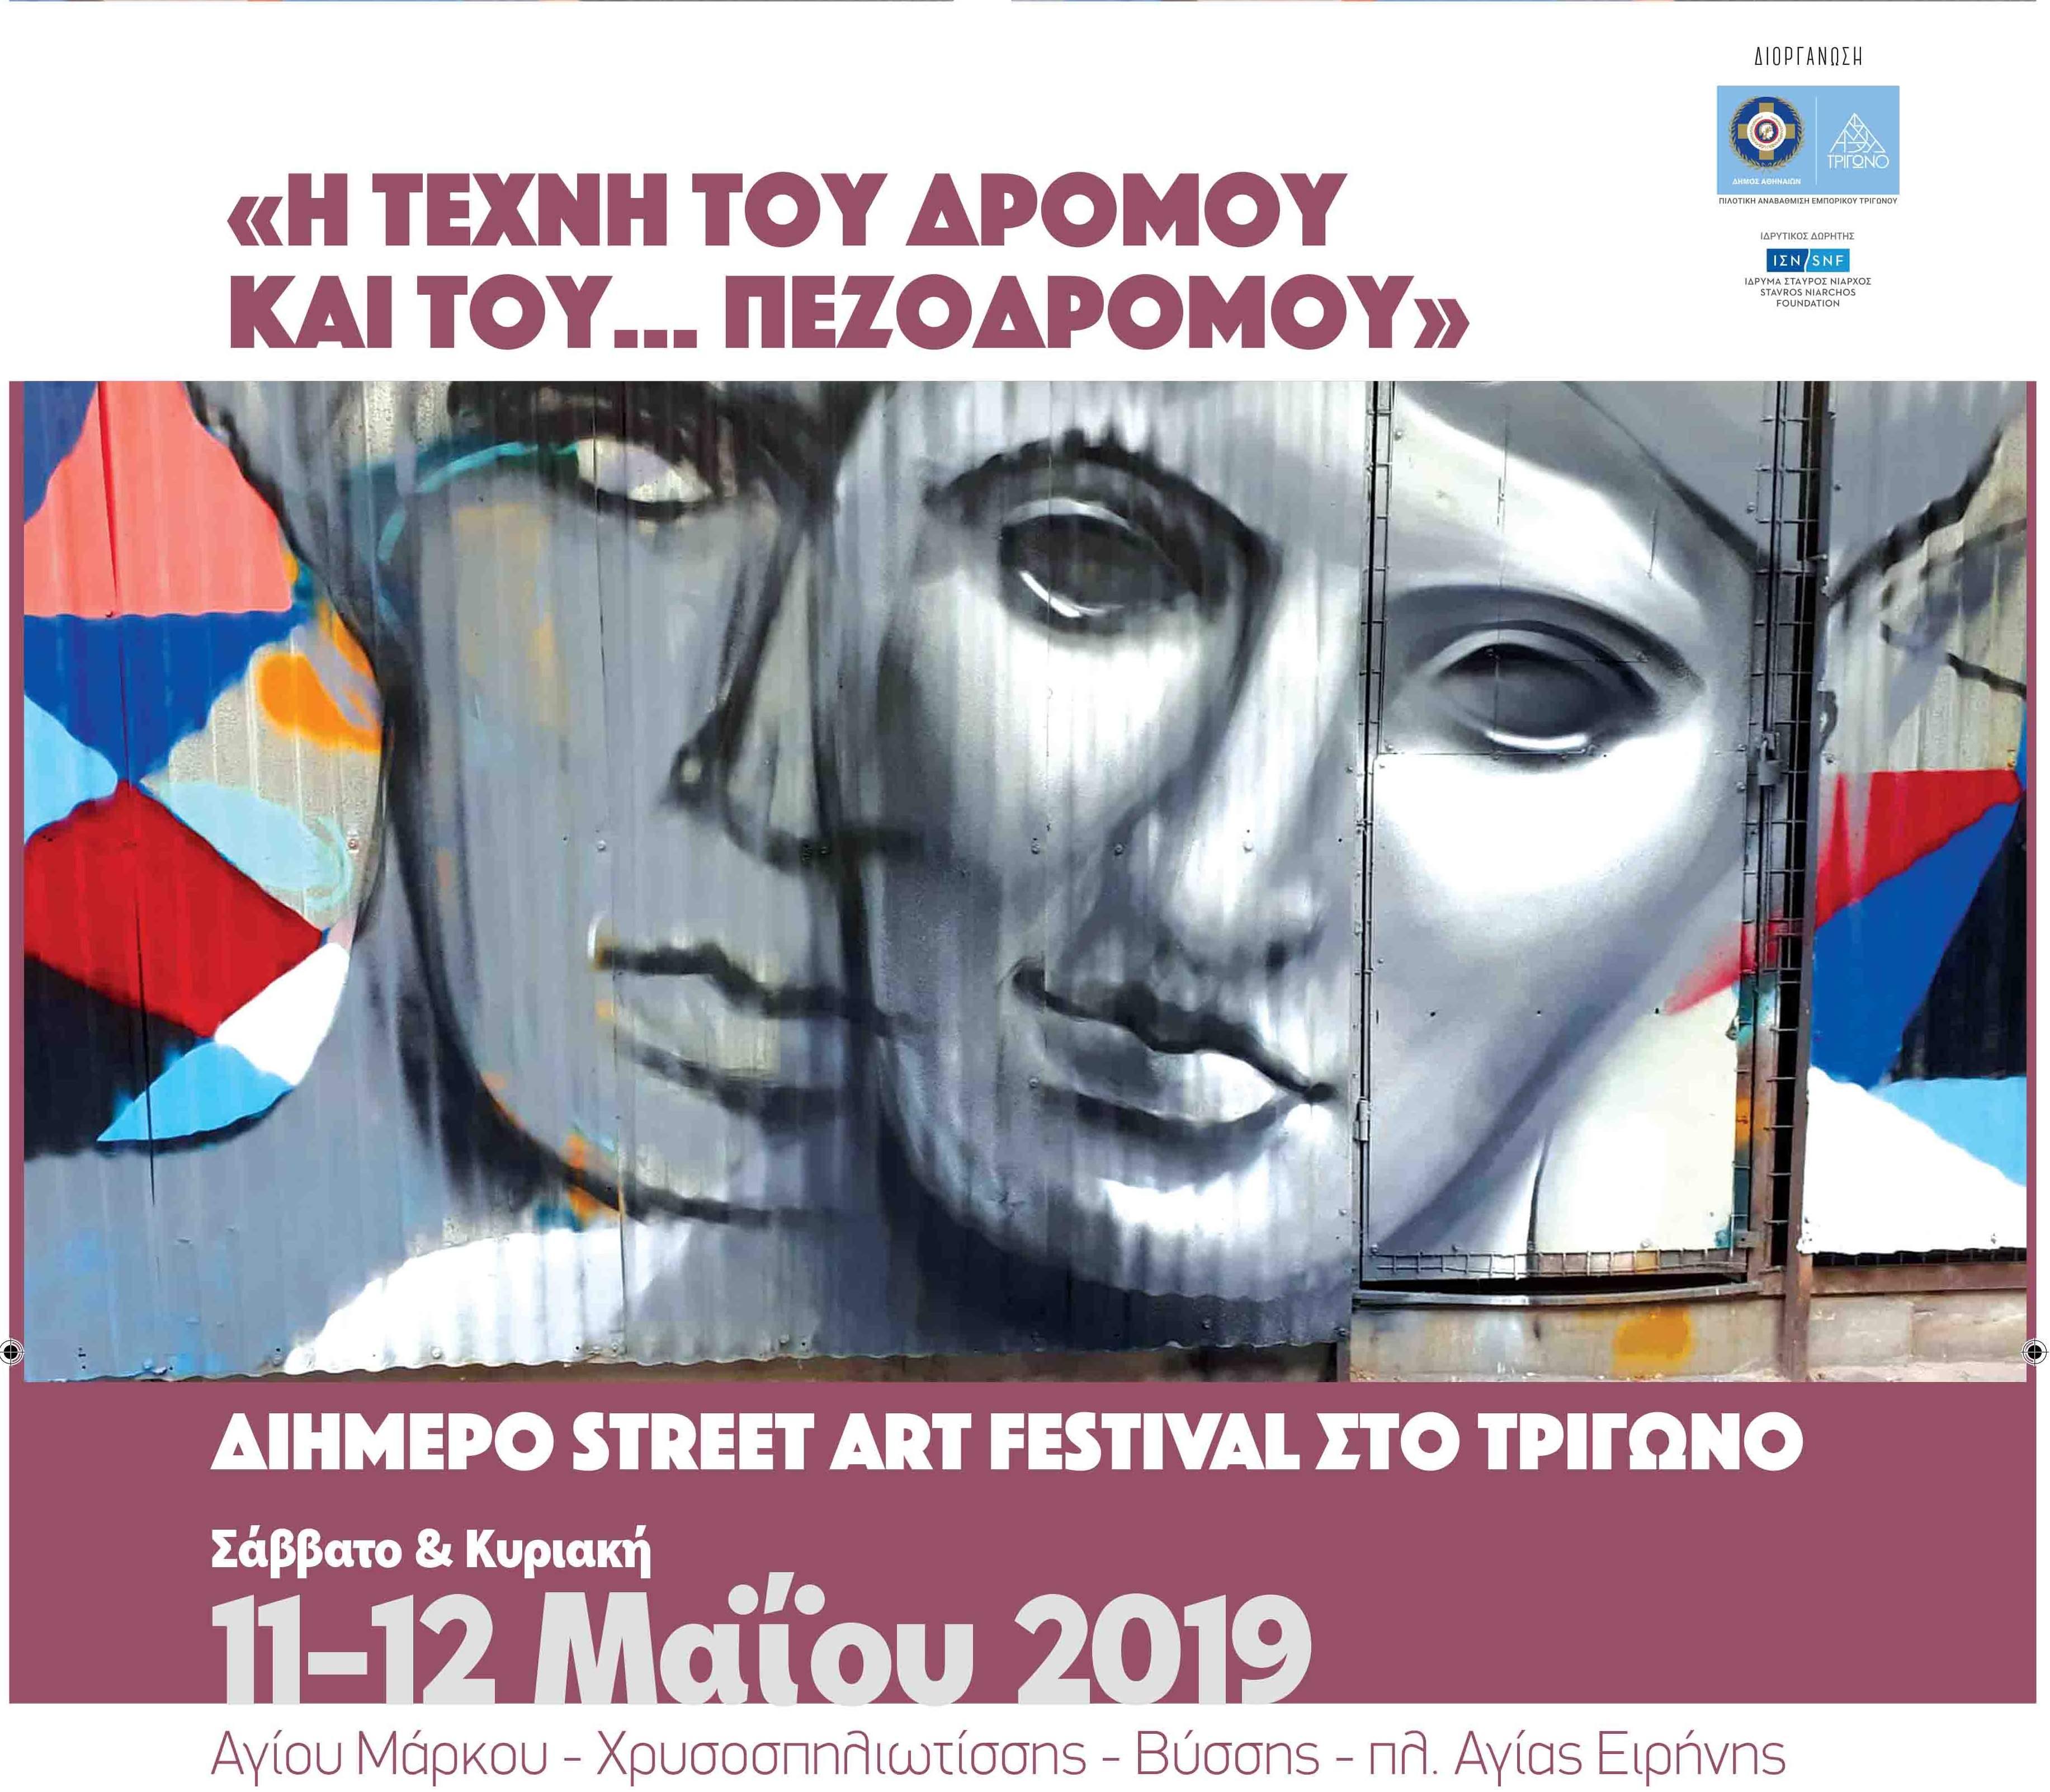 82bce261b590 Το Σαββατοκύριακο 11 και 12 Μαΐου ο Δημος Αθηναίων μας καλεί στο Εμπορικό  Τρίγωνο της Αθήνας διοργανώνοντας μια σειρά δράσεων πολιτισμού με ελεύθερη  ...